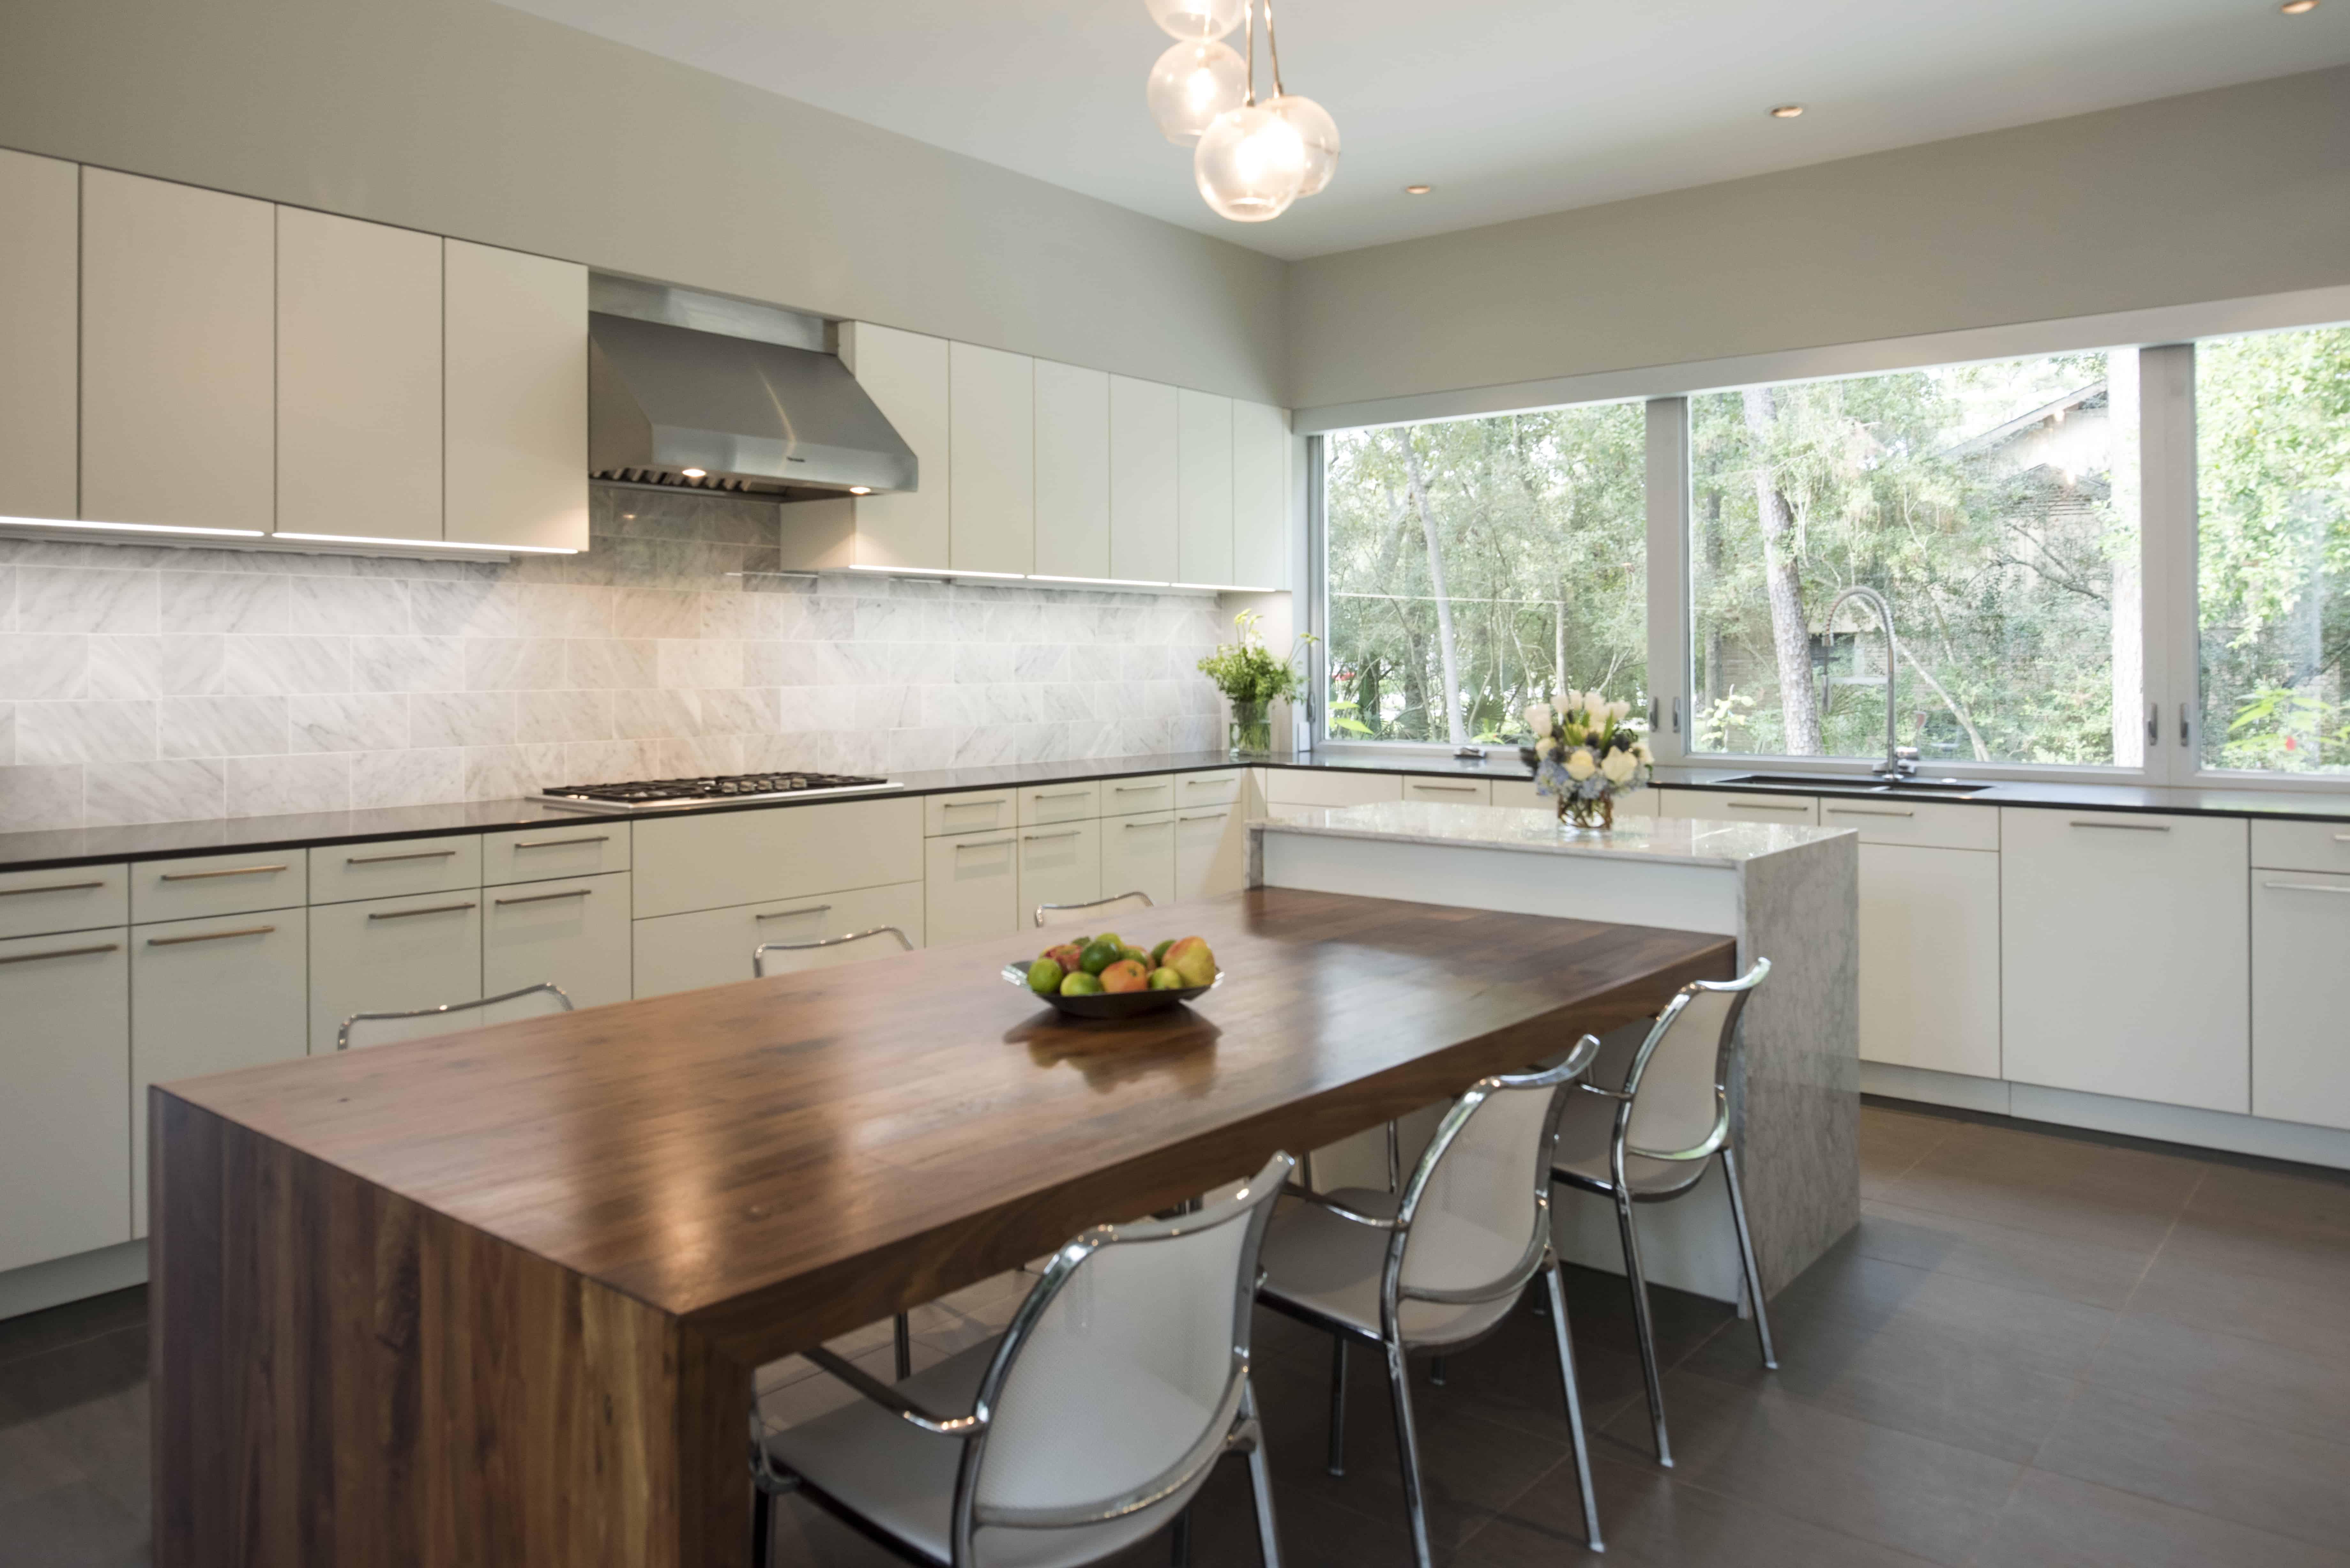 Hunters Creek Memorial Modern Custom Home kitchen grey and white with walnut island